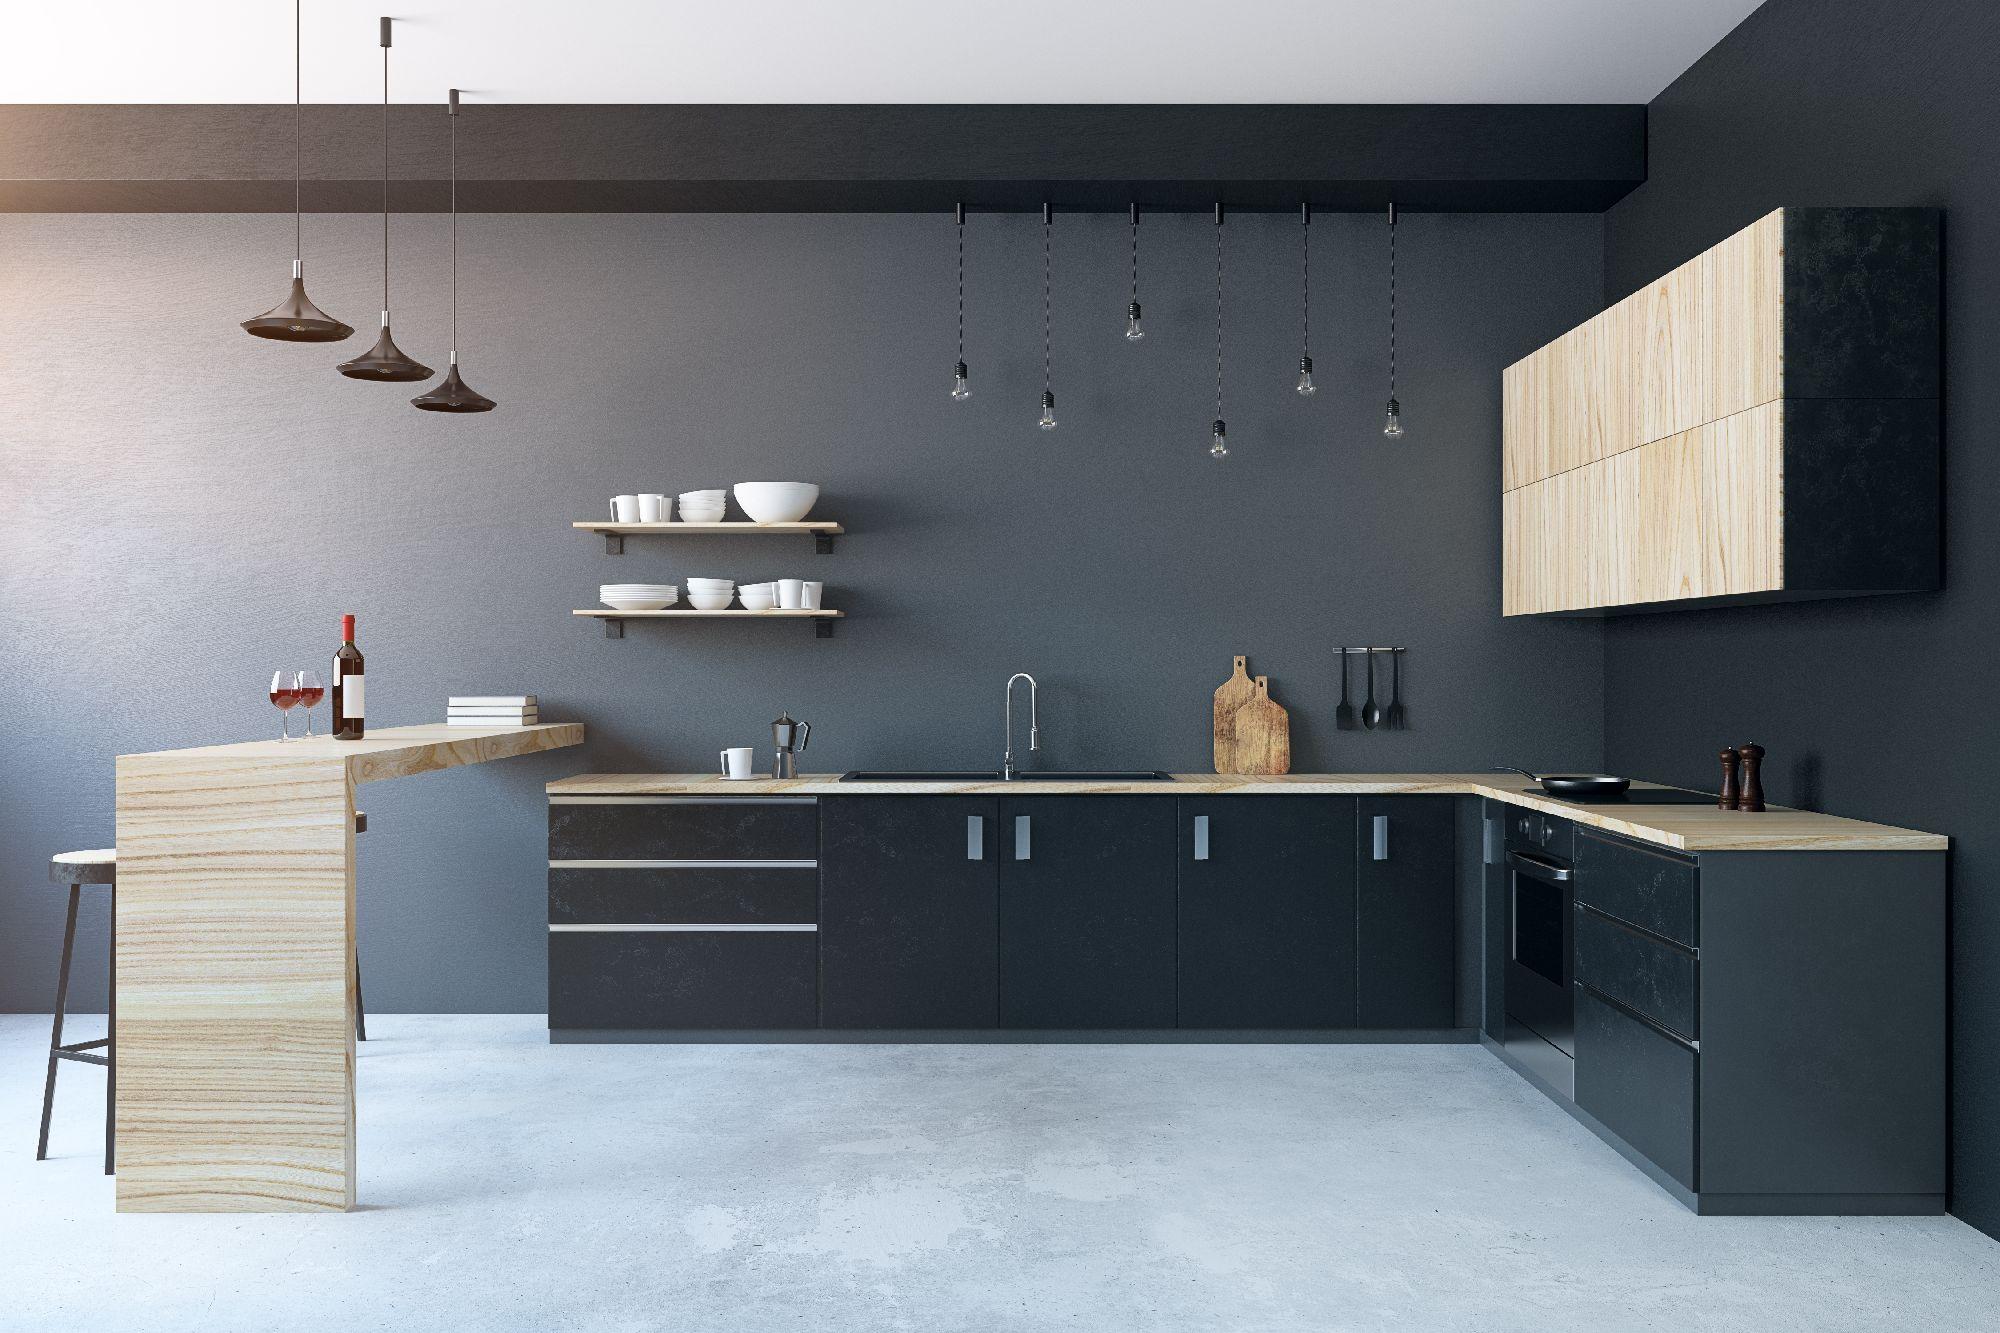 Kuchyna01